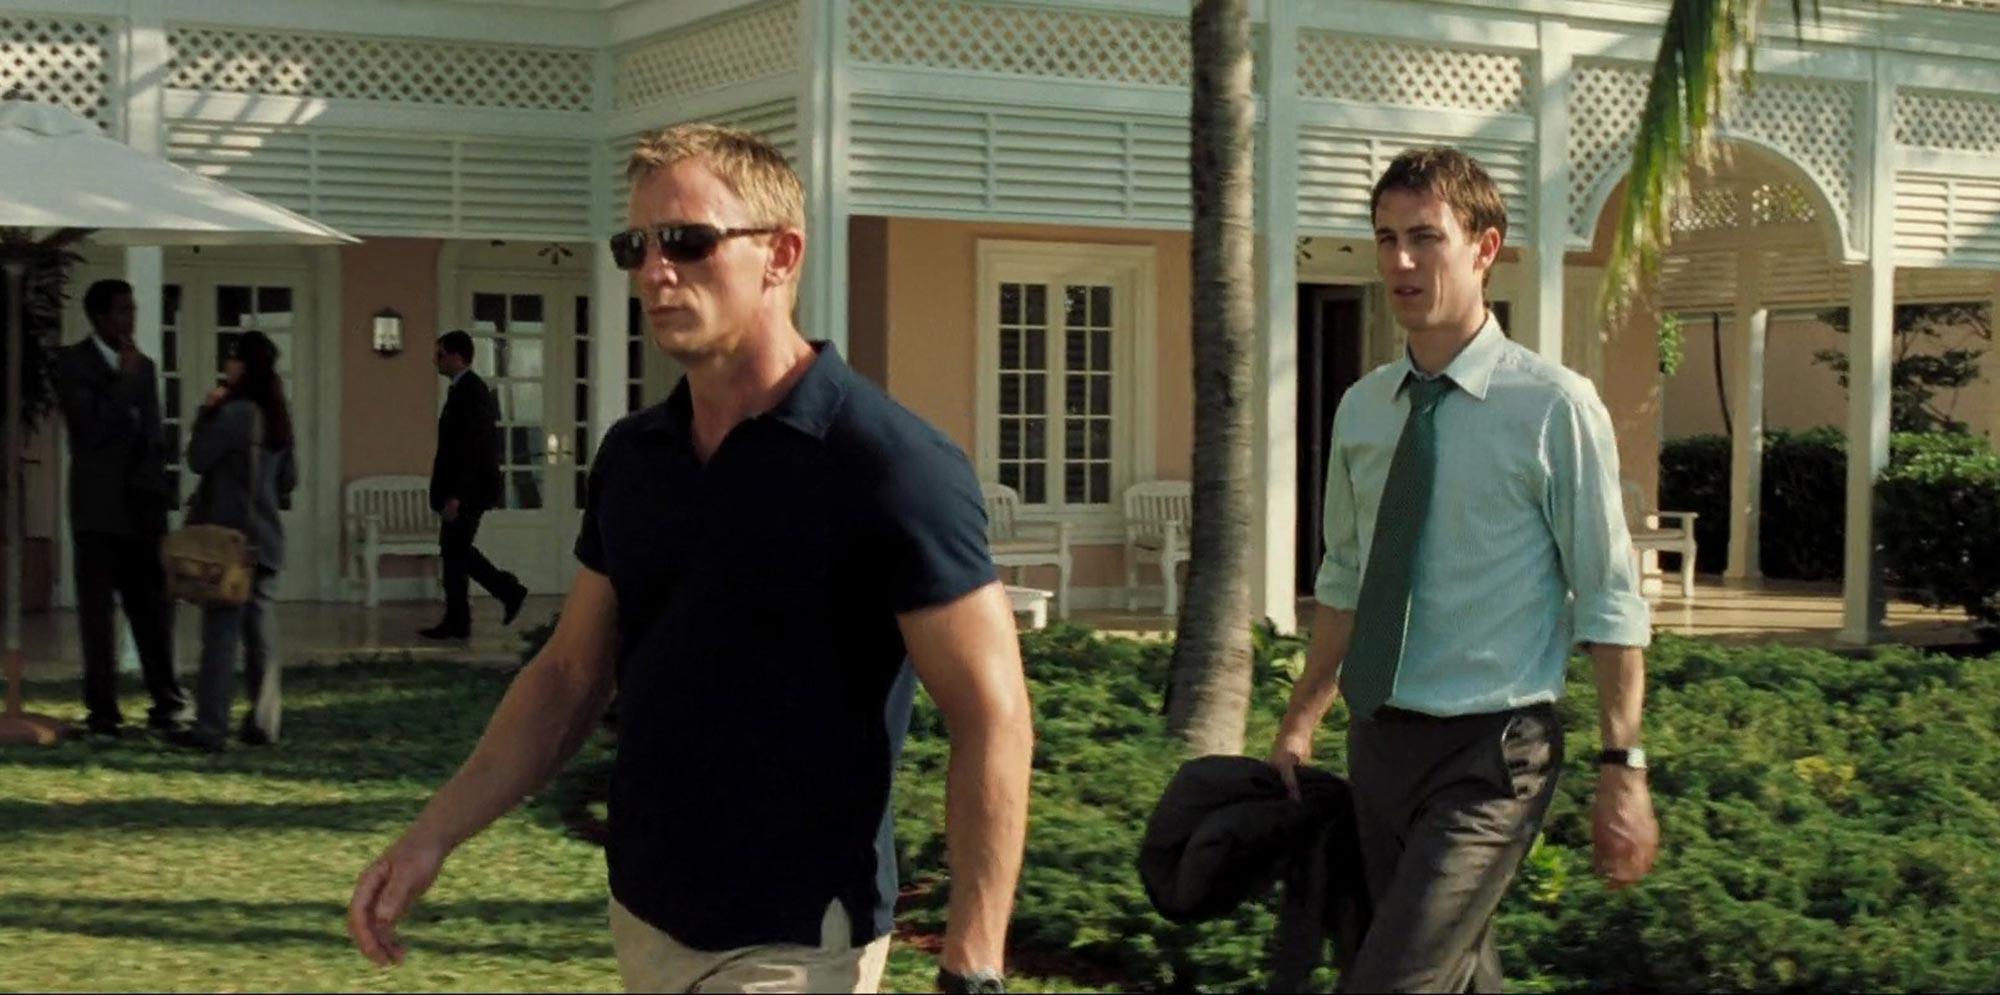 Bond Cameos - Tobias Menzies in Casino Royale